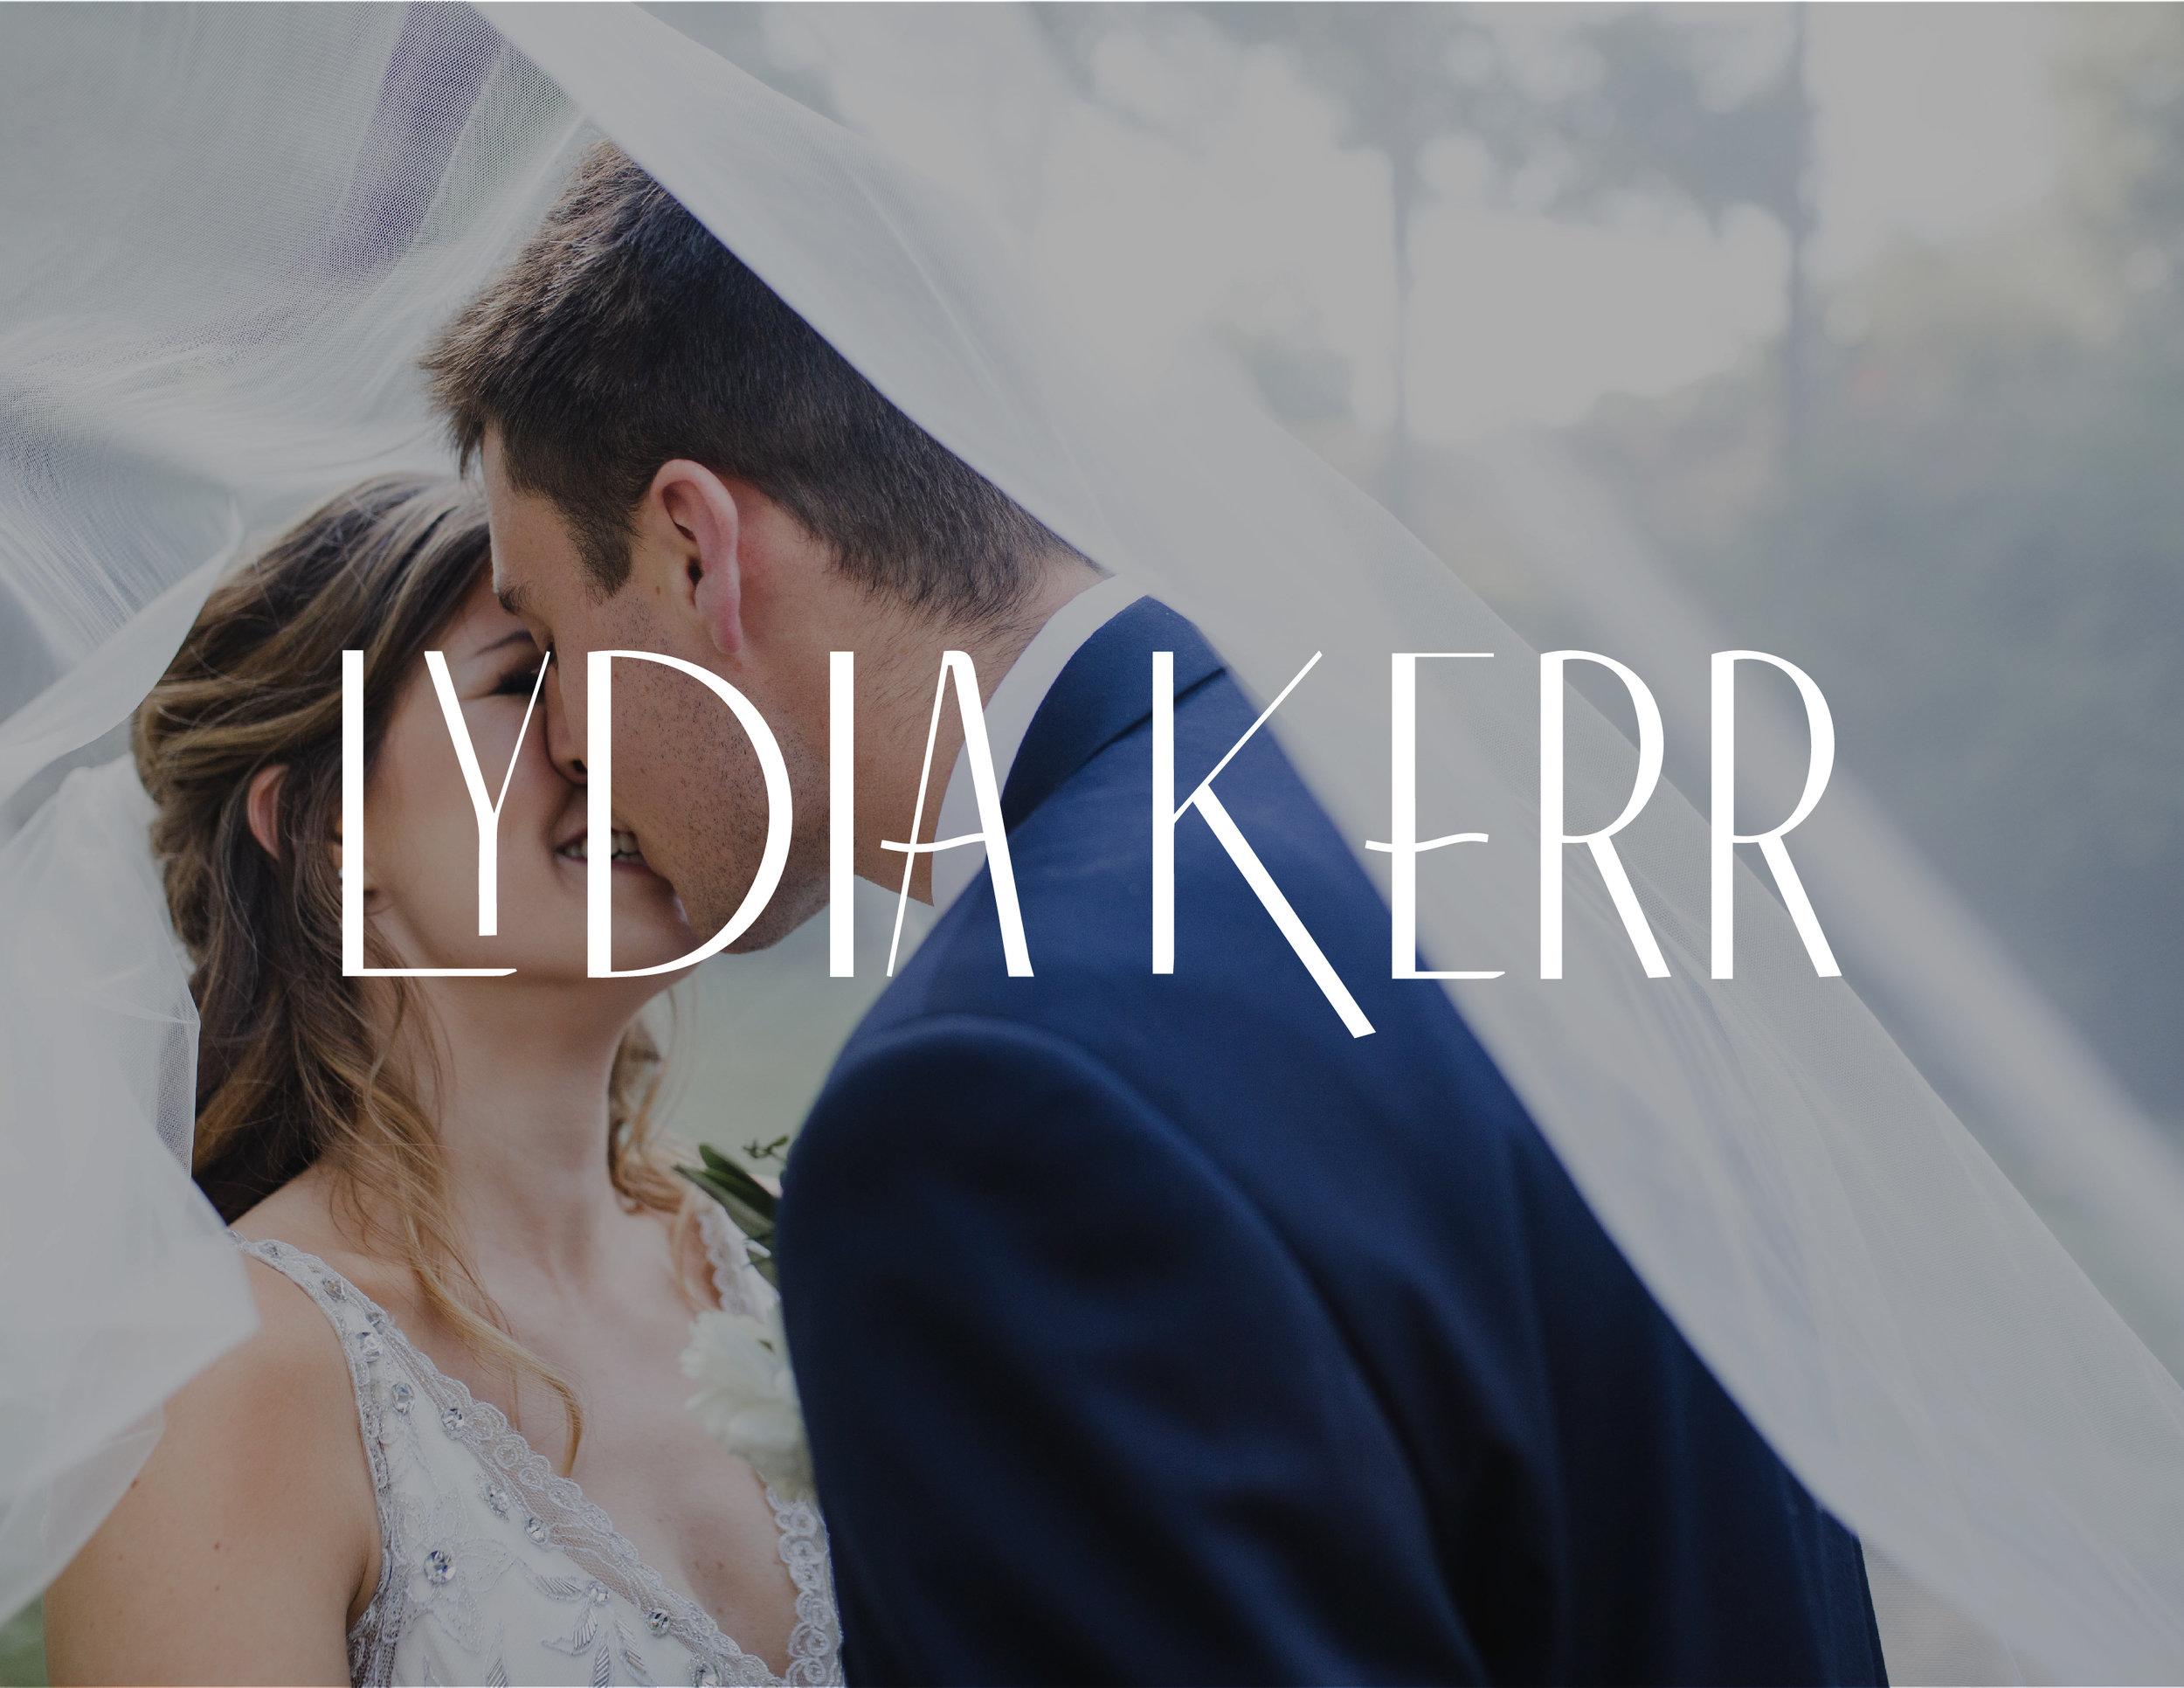 Lydia-PortfolioArtboard 113.jpg